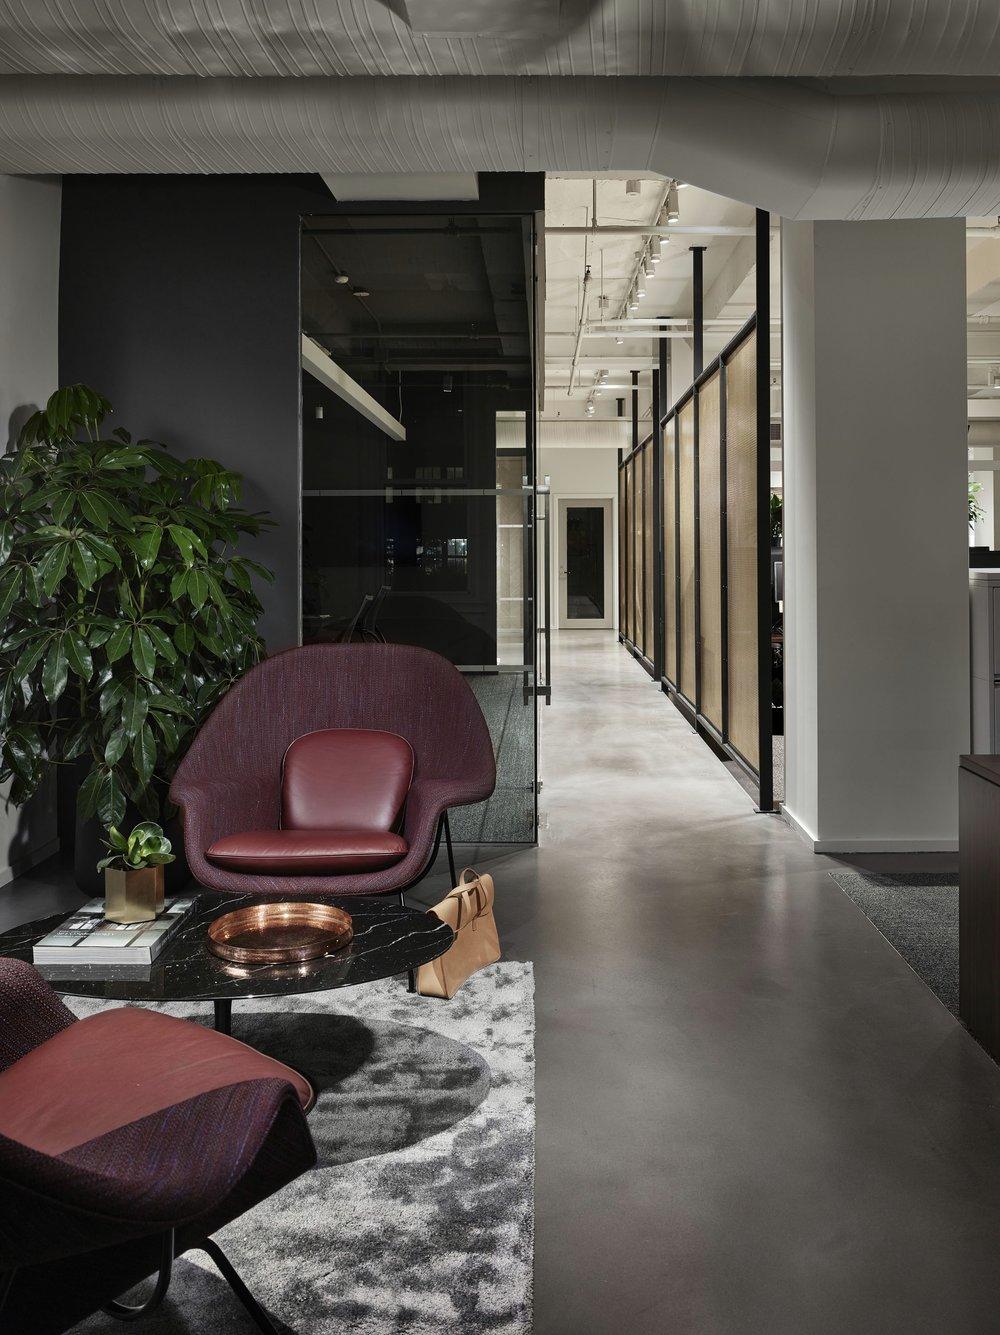 Corcoran Chelsea Hallway Seating Area